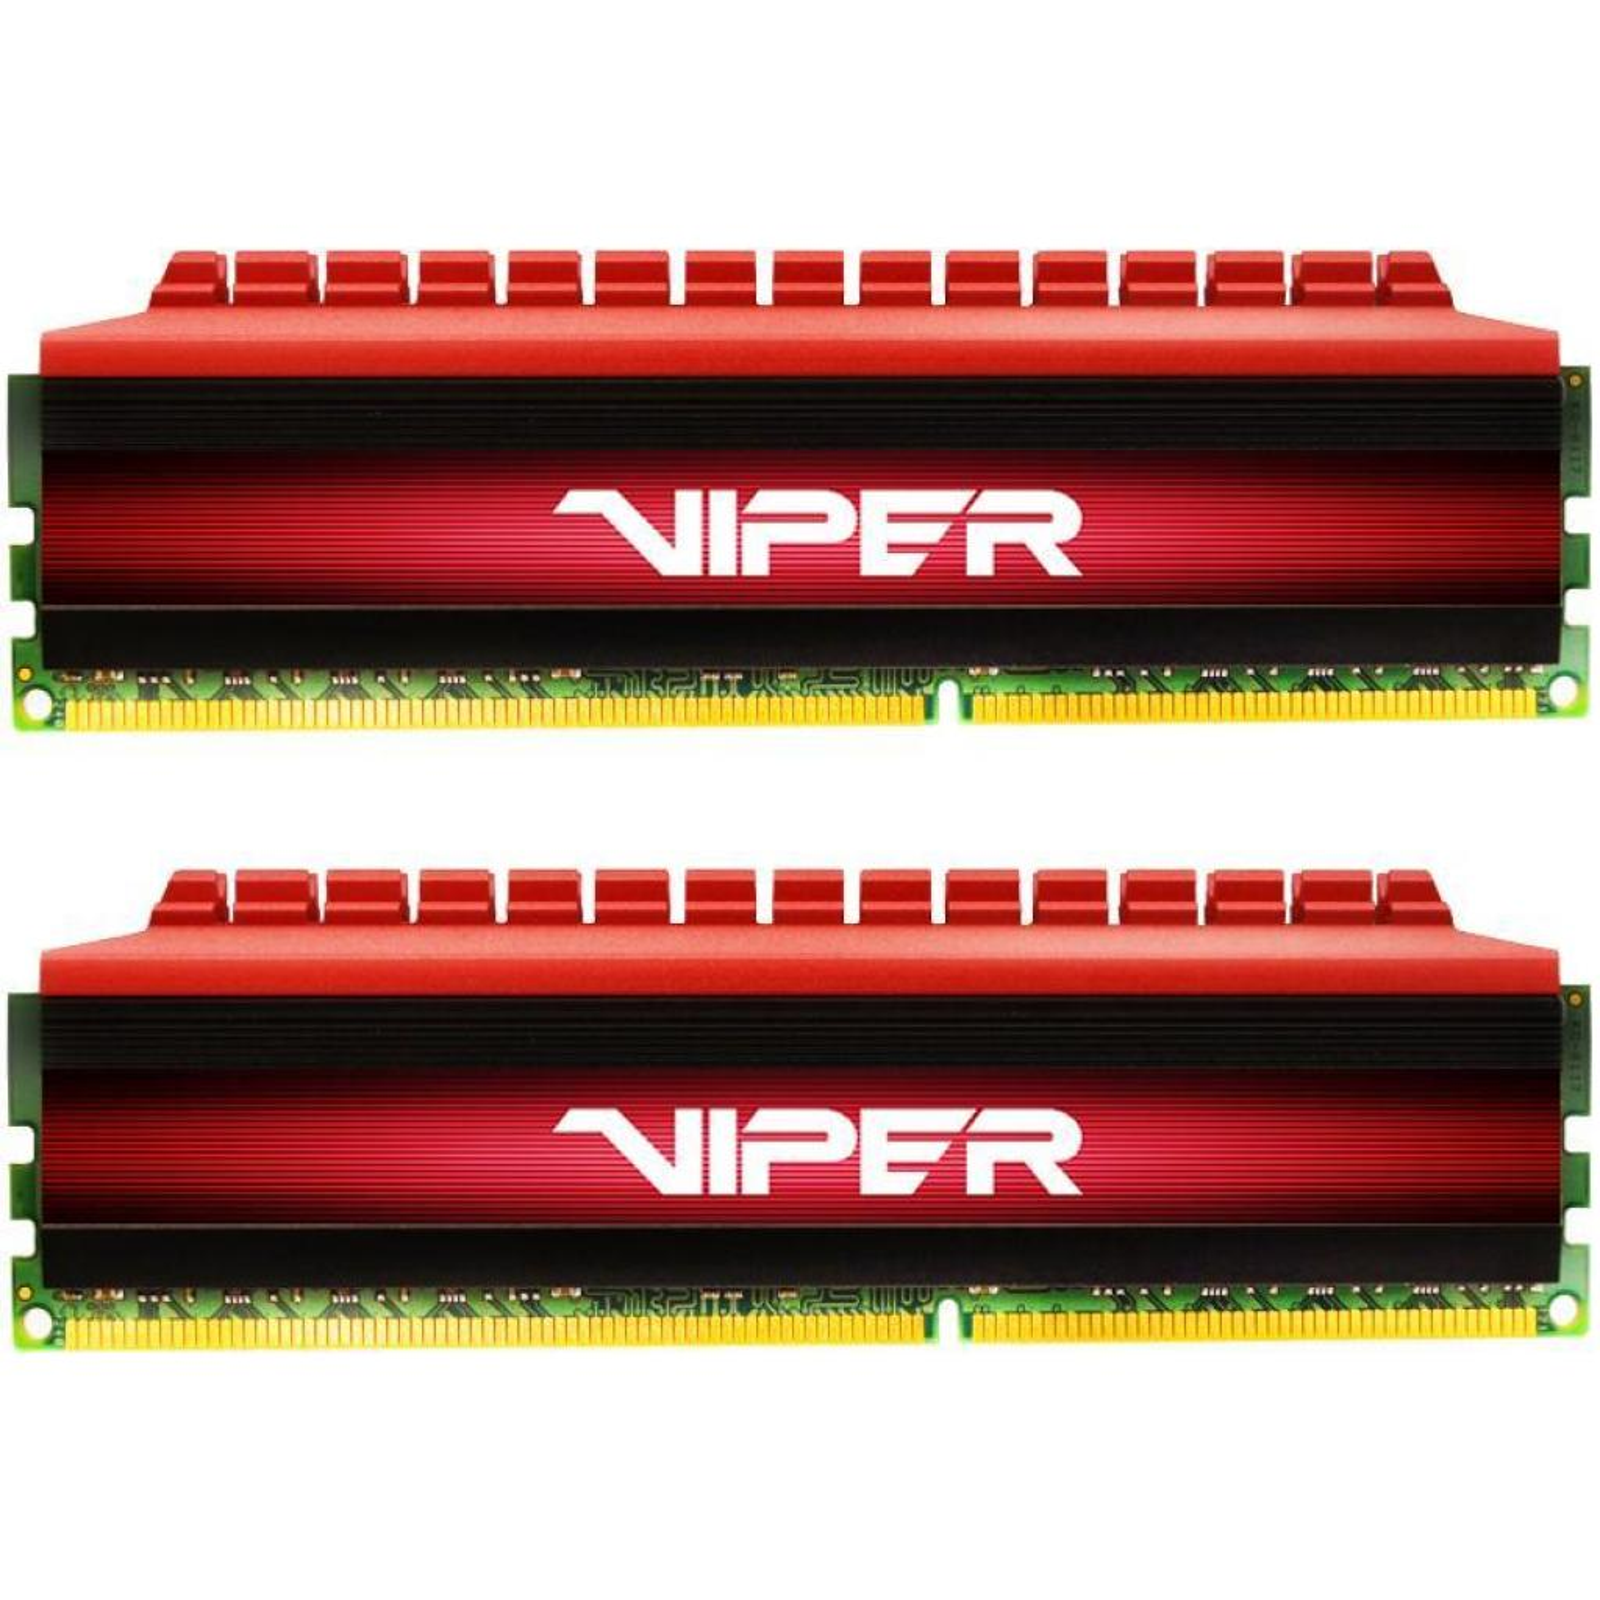 Модуль памяти для компьютера DDR4 8GB (2x4GB) 3200 MHz Viper 4 Red Patriot (PV48G320C6K)